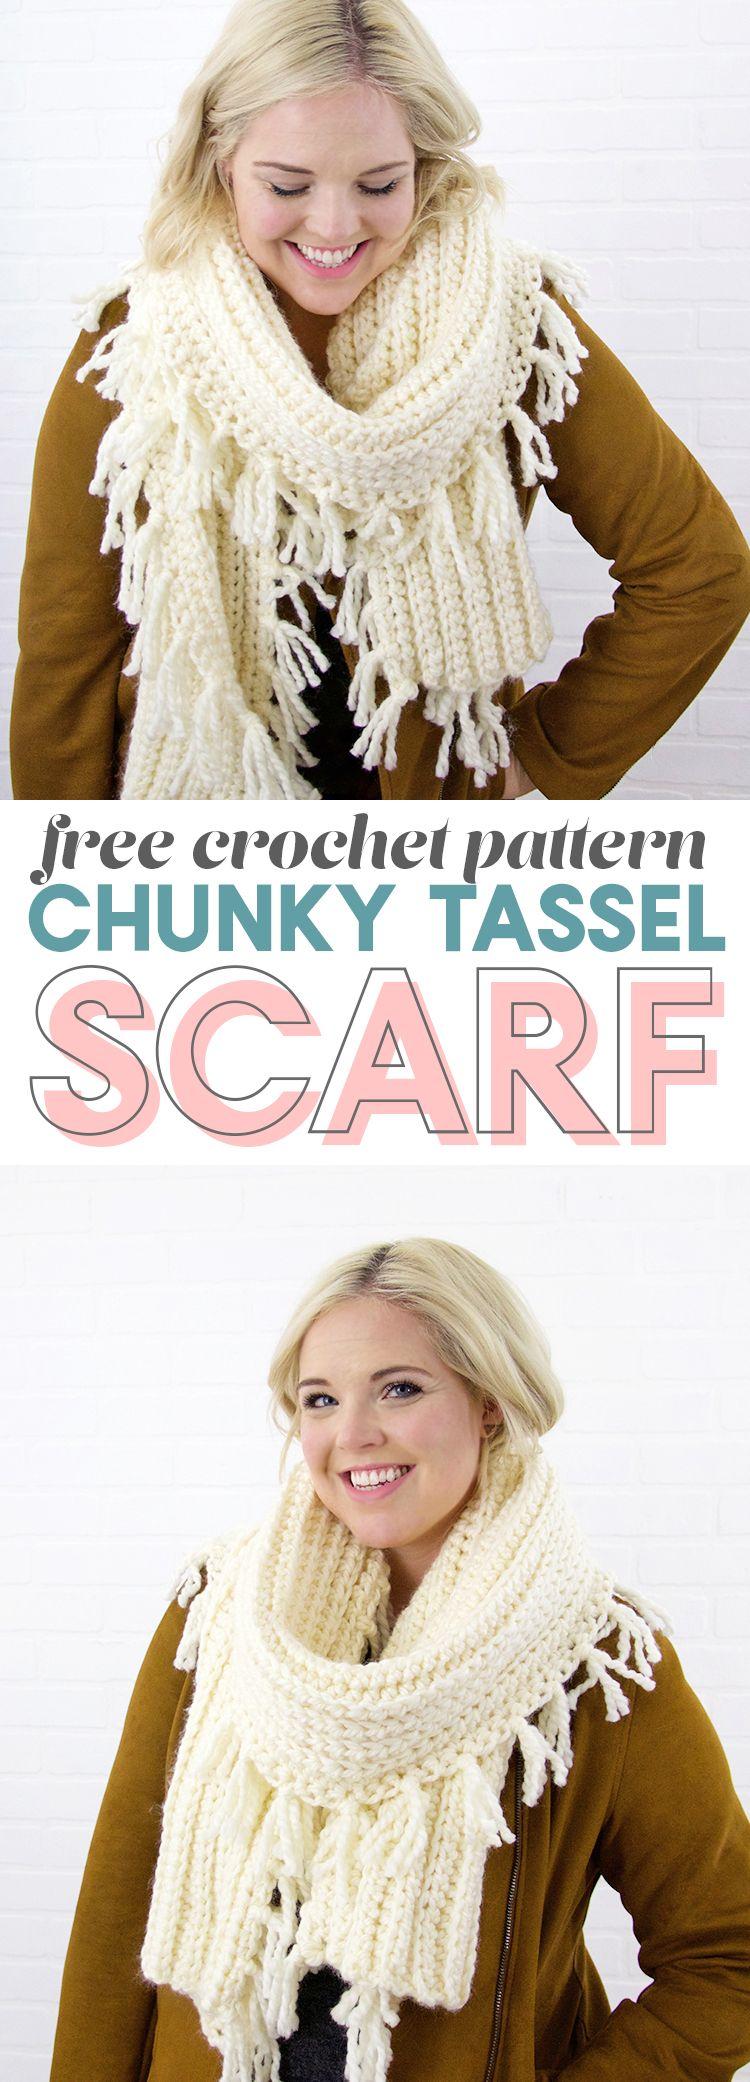 Chunky Tassel Crochet Scarf Pattern | Ganchillo y Tejido